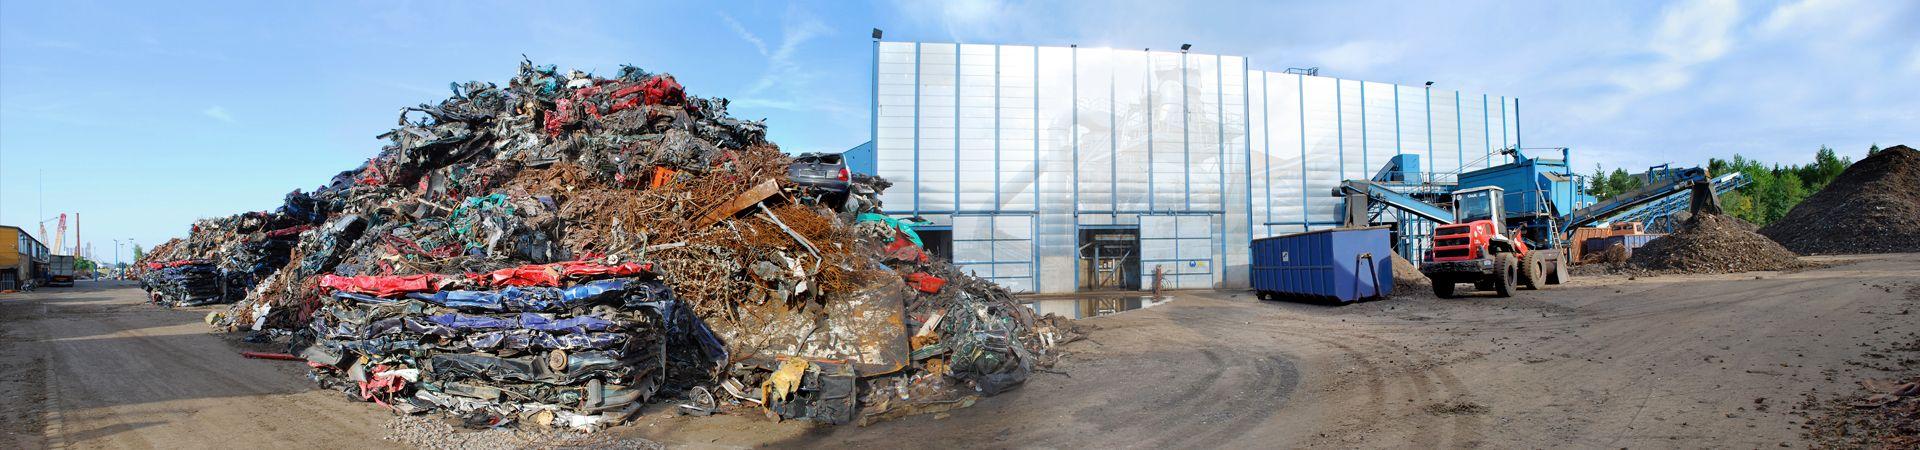 Max Aicher Head3 Umwelt Recycling